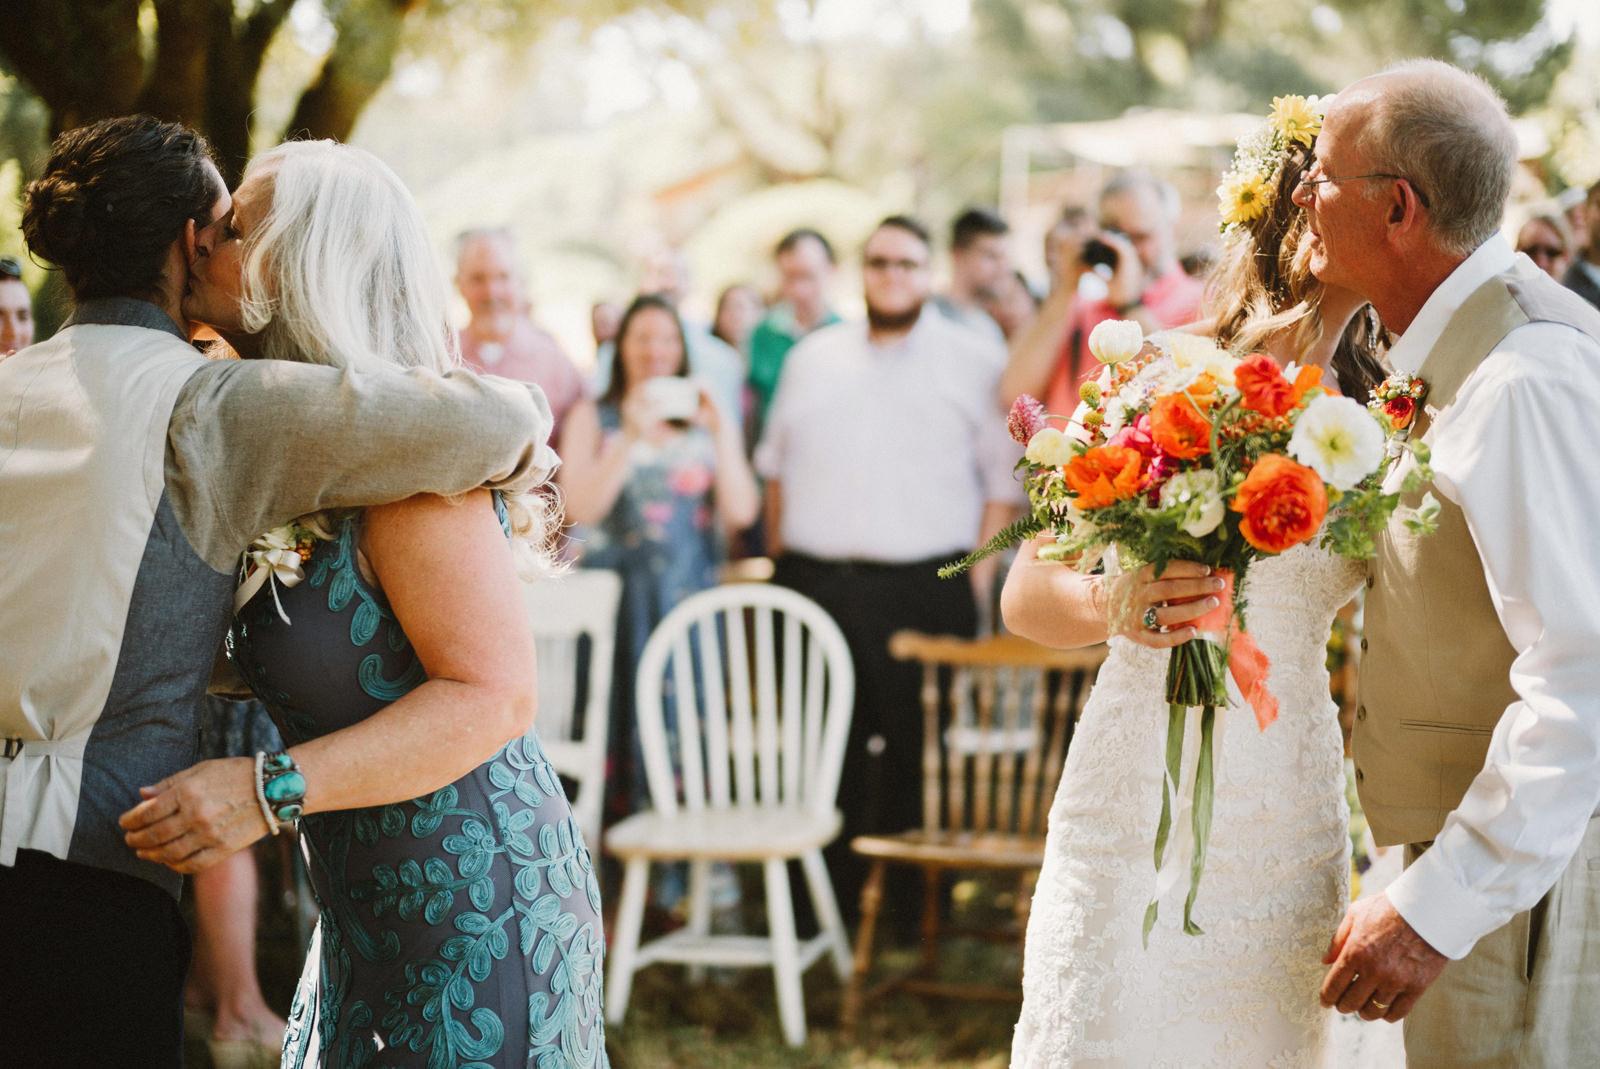 rivers-bend-retreat-wedding-020 RIVER'S BEND RETREAT WEDDING